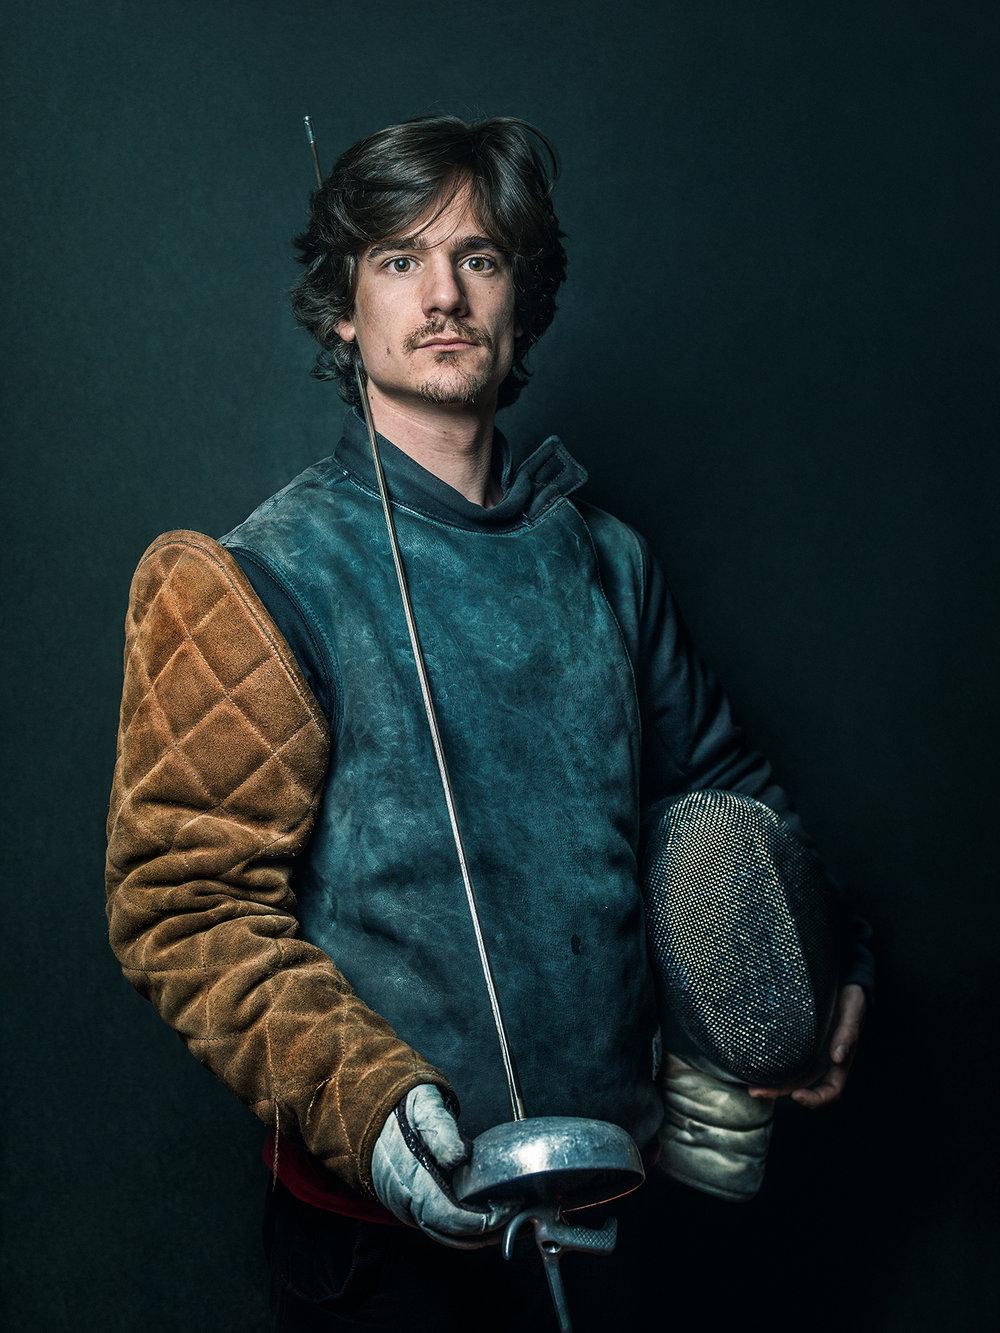 Oscar-arribas-esgrima-maestro-fencing-master-fencer-fechten-scherma-escrime-portrait-fotografo-retrato-photographer026.jpg